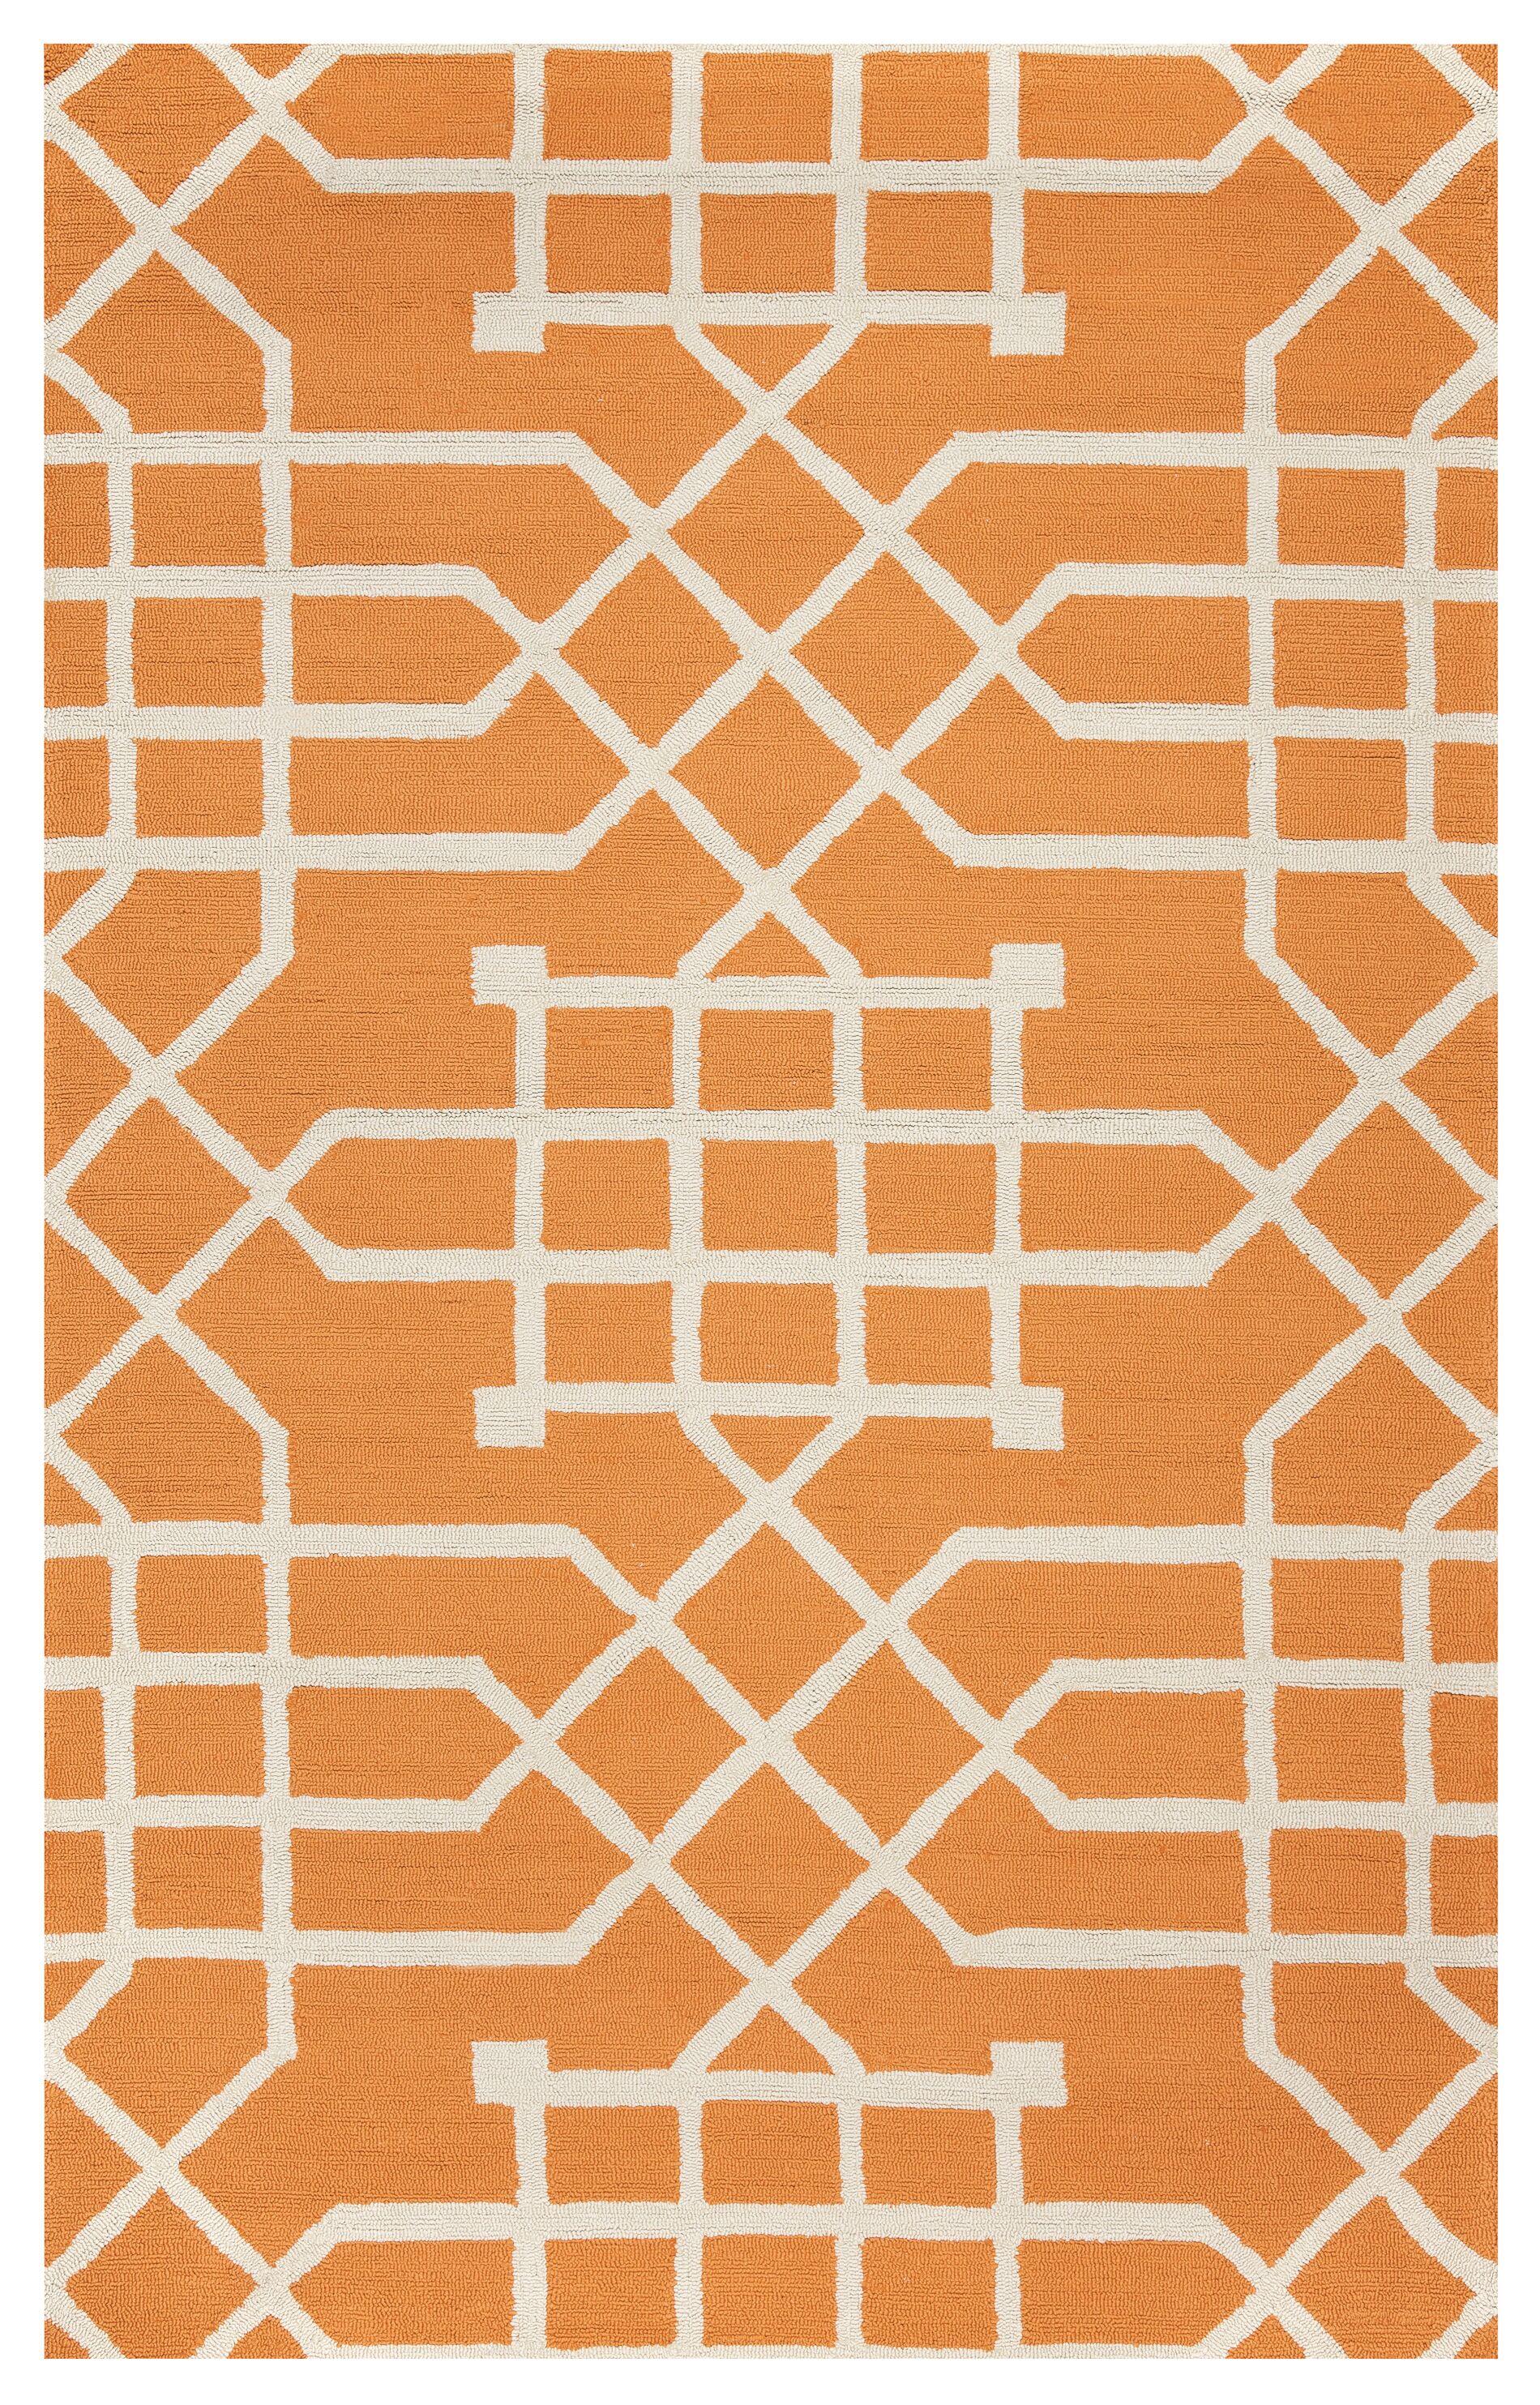 Angela Hand-Tufted Orange Indoor/Outdoor Area Rug Size: Rectangle 9' x 12'